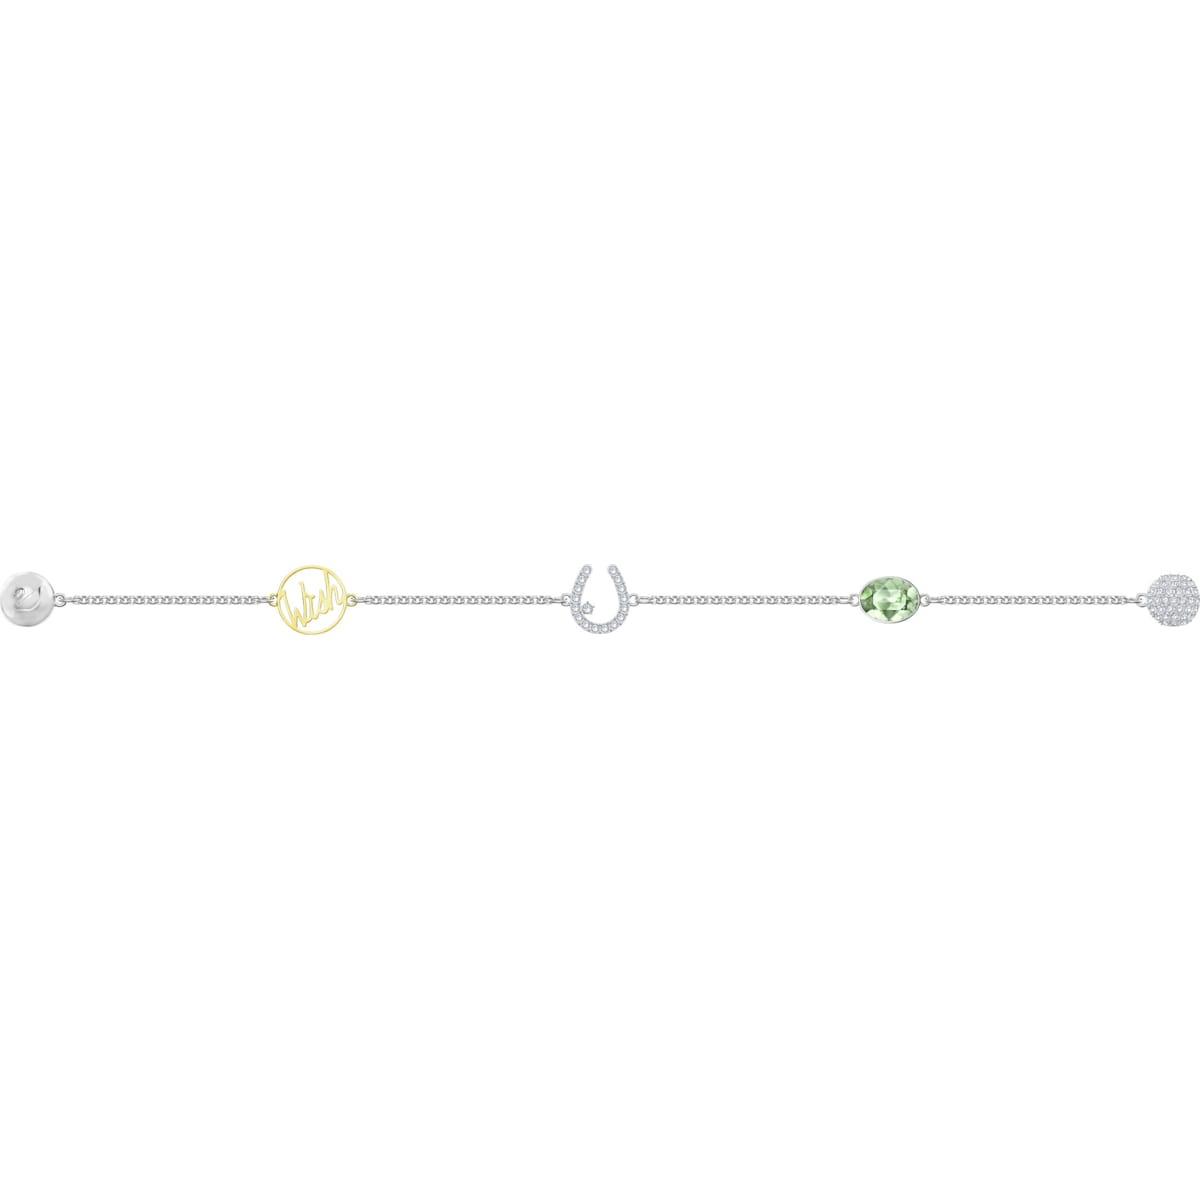 c95dda21e9749 Swarovski Remix Collection Wish Strand, White, Mixed metal finish